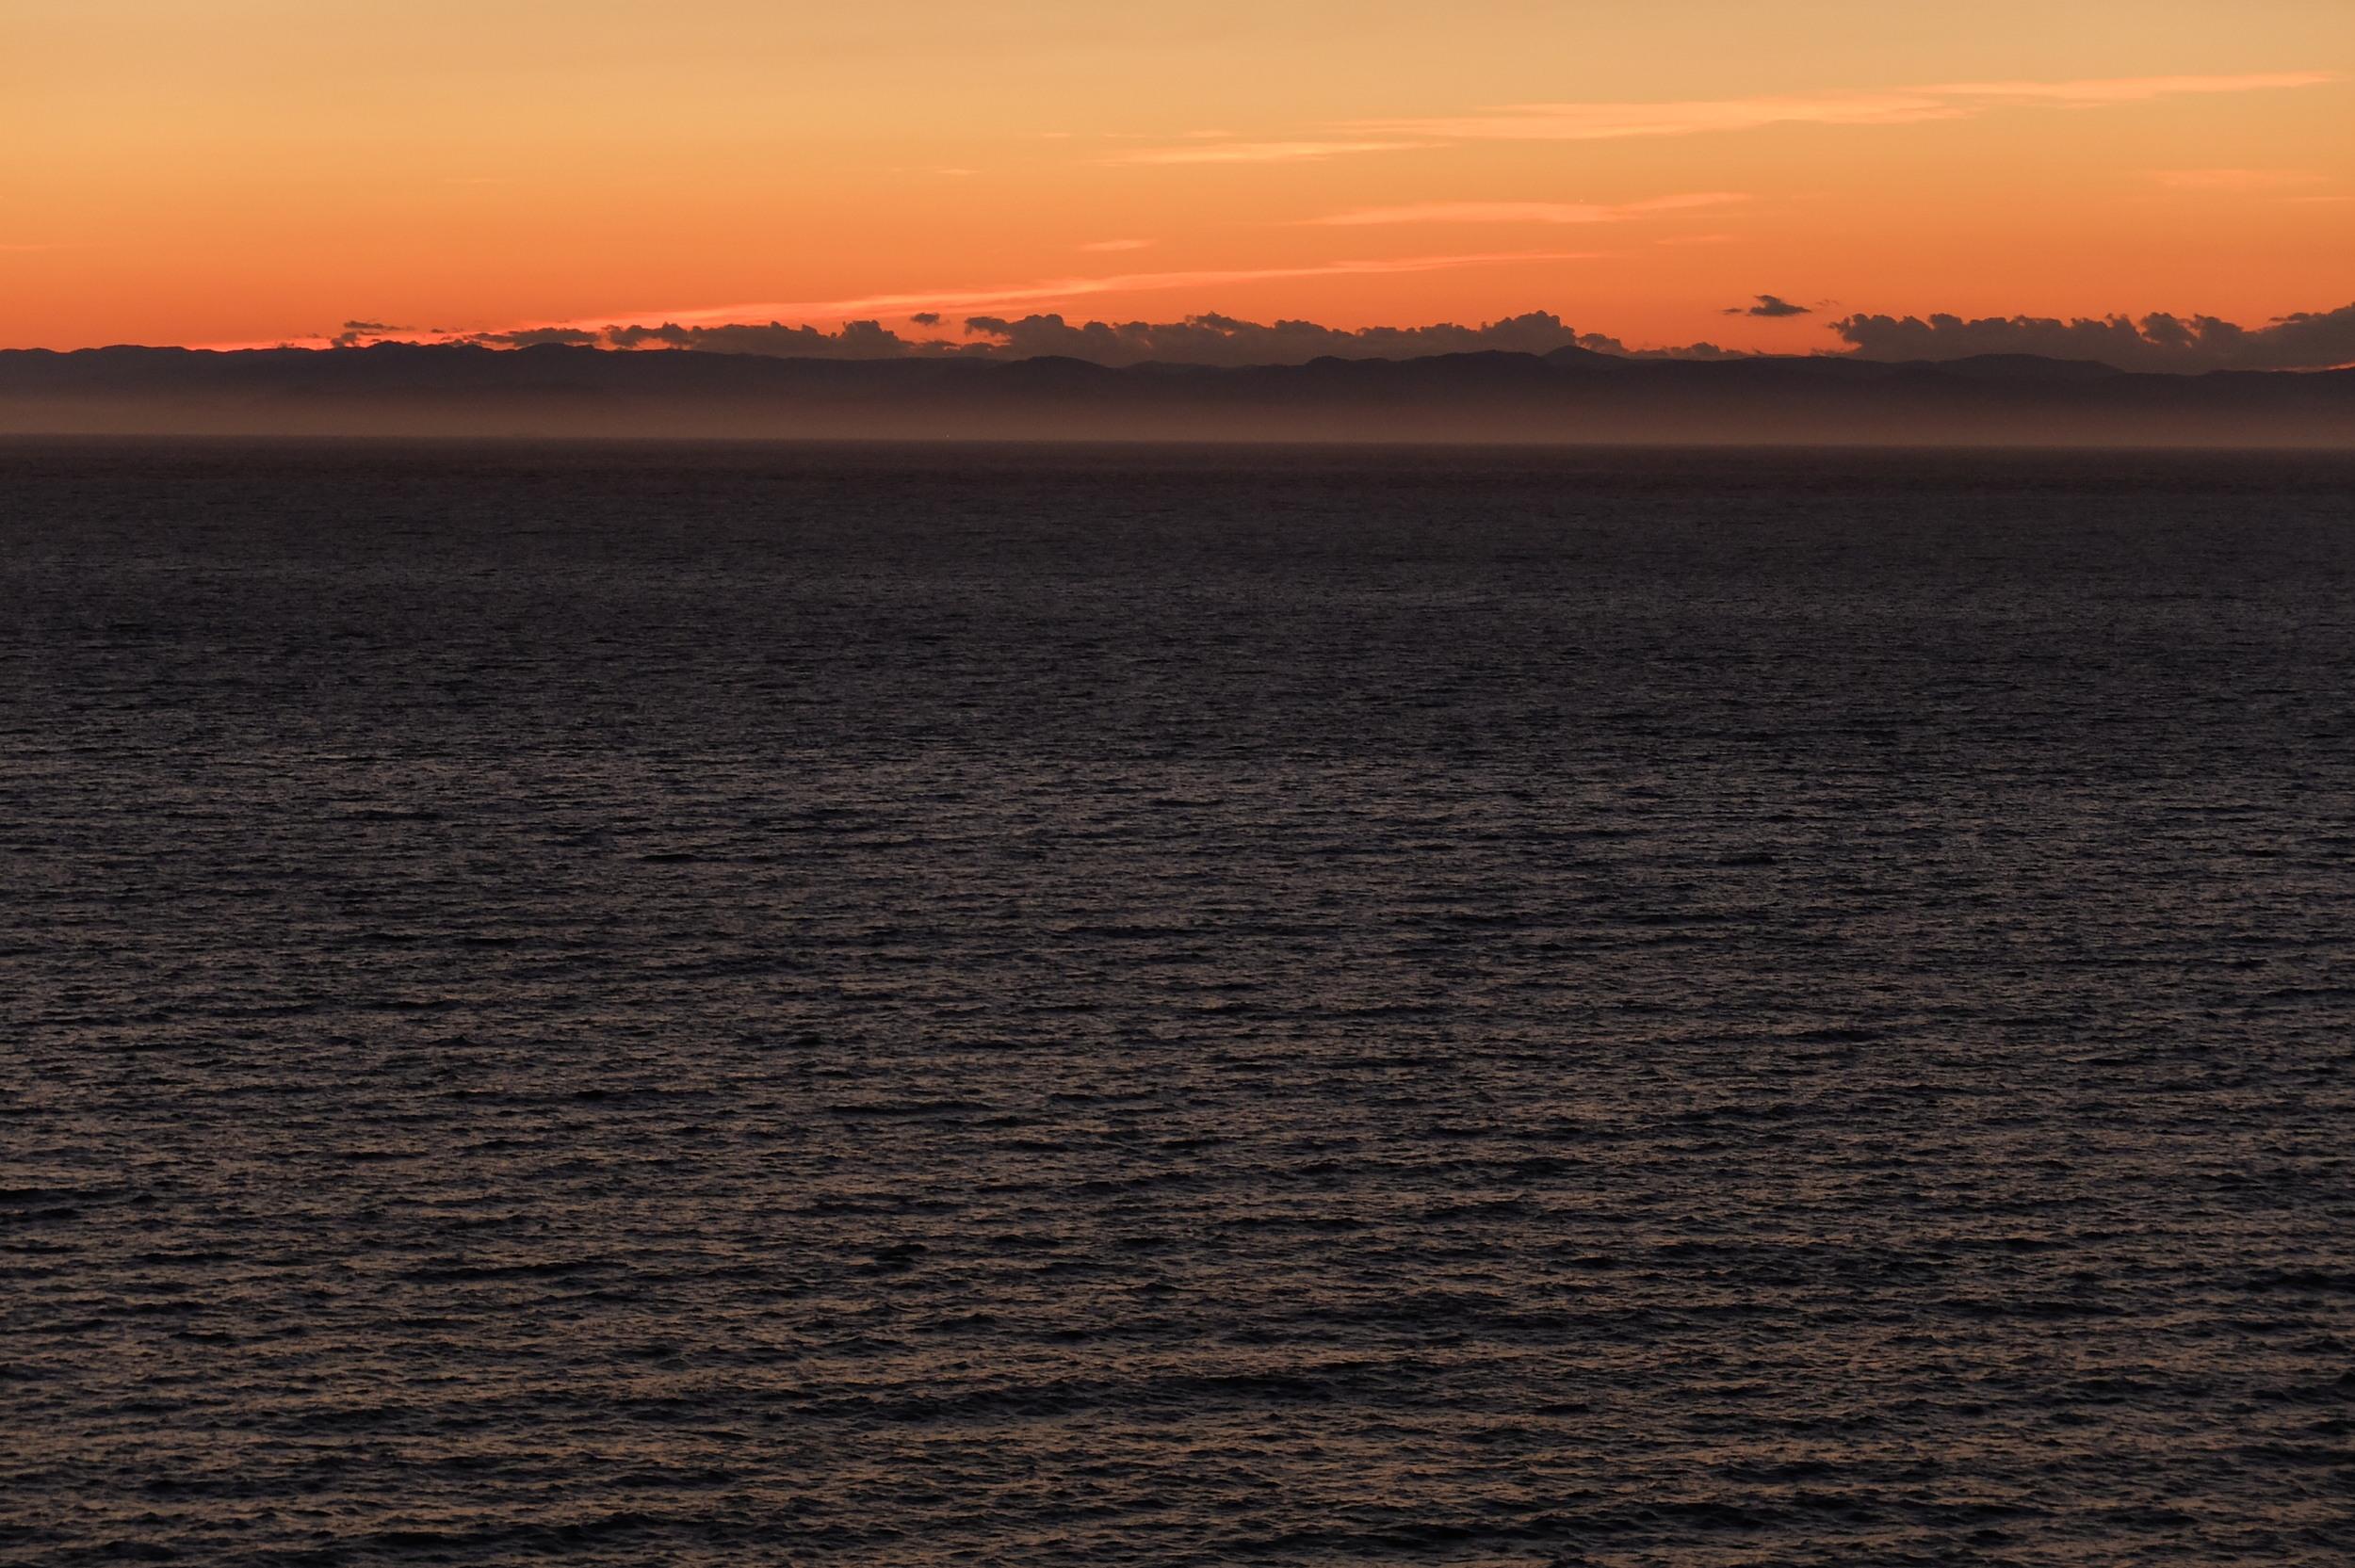 sunset near olympic national park